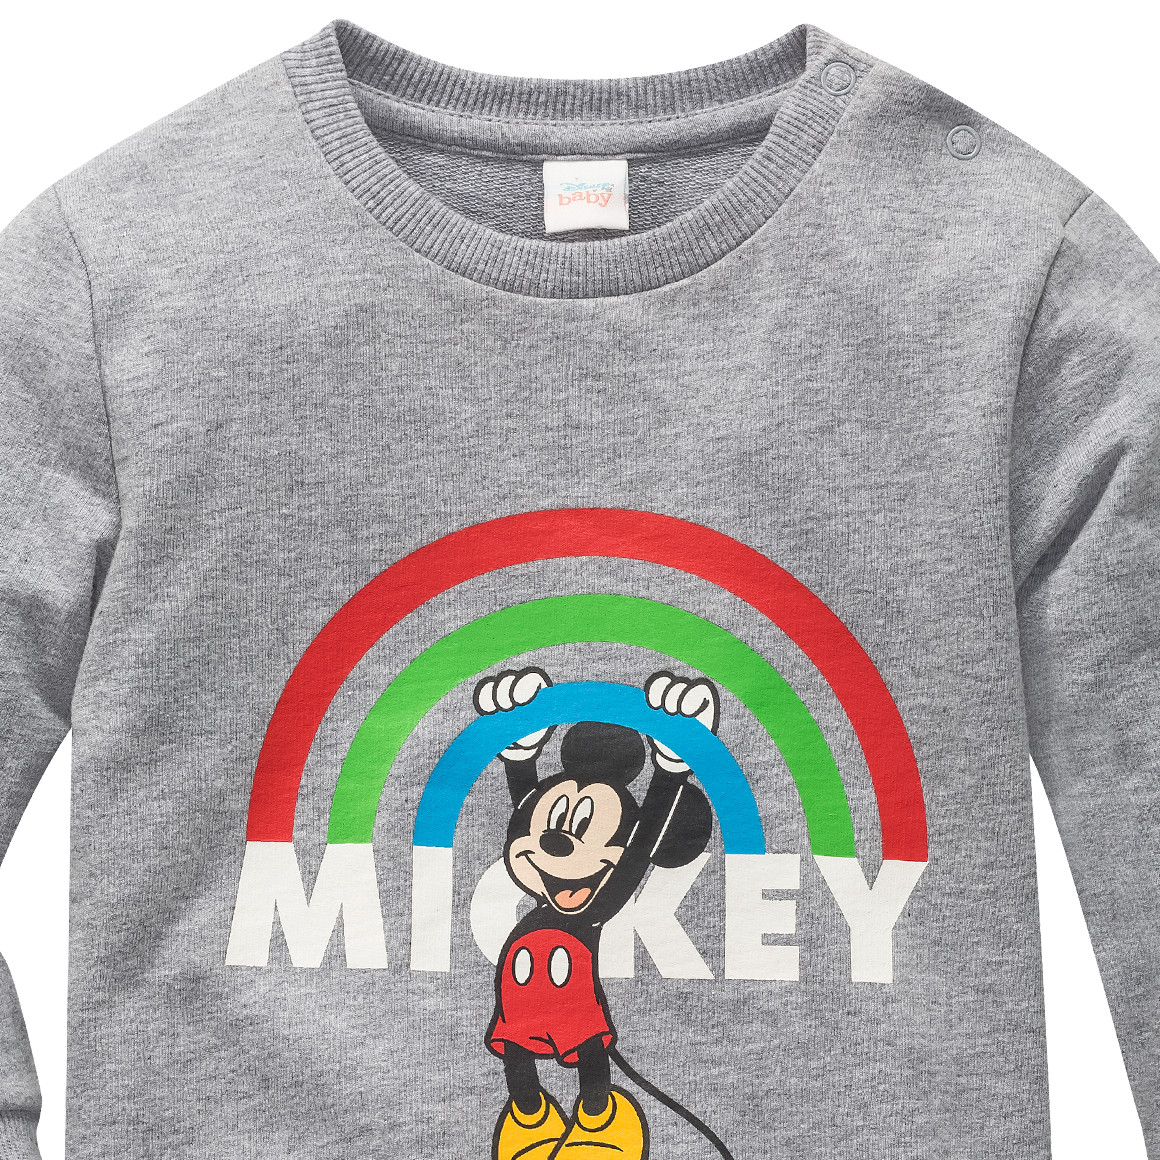 Micky Maus Sweatshirt mit großem Print | Ernsting's family